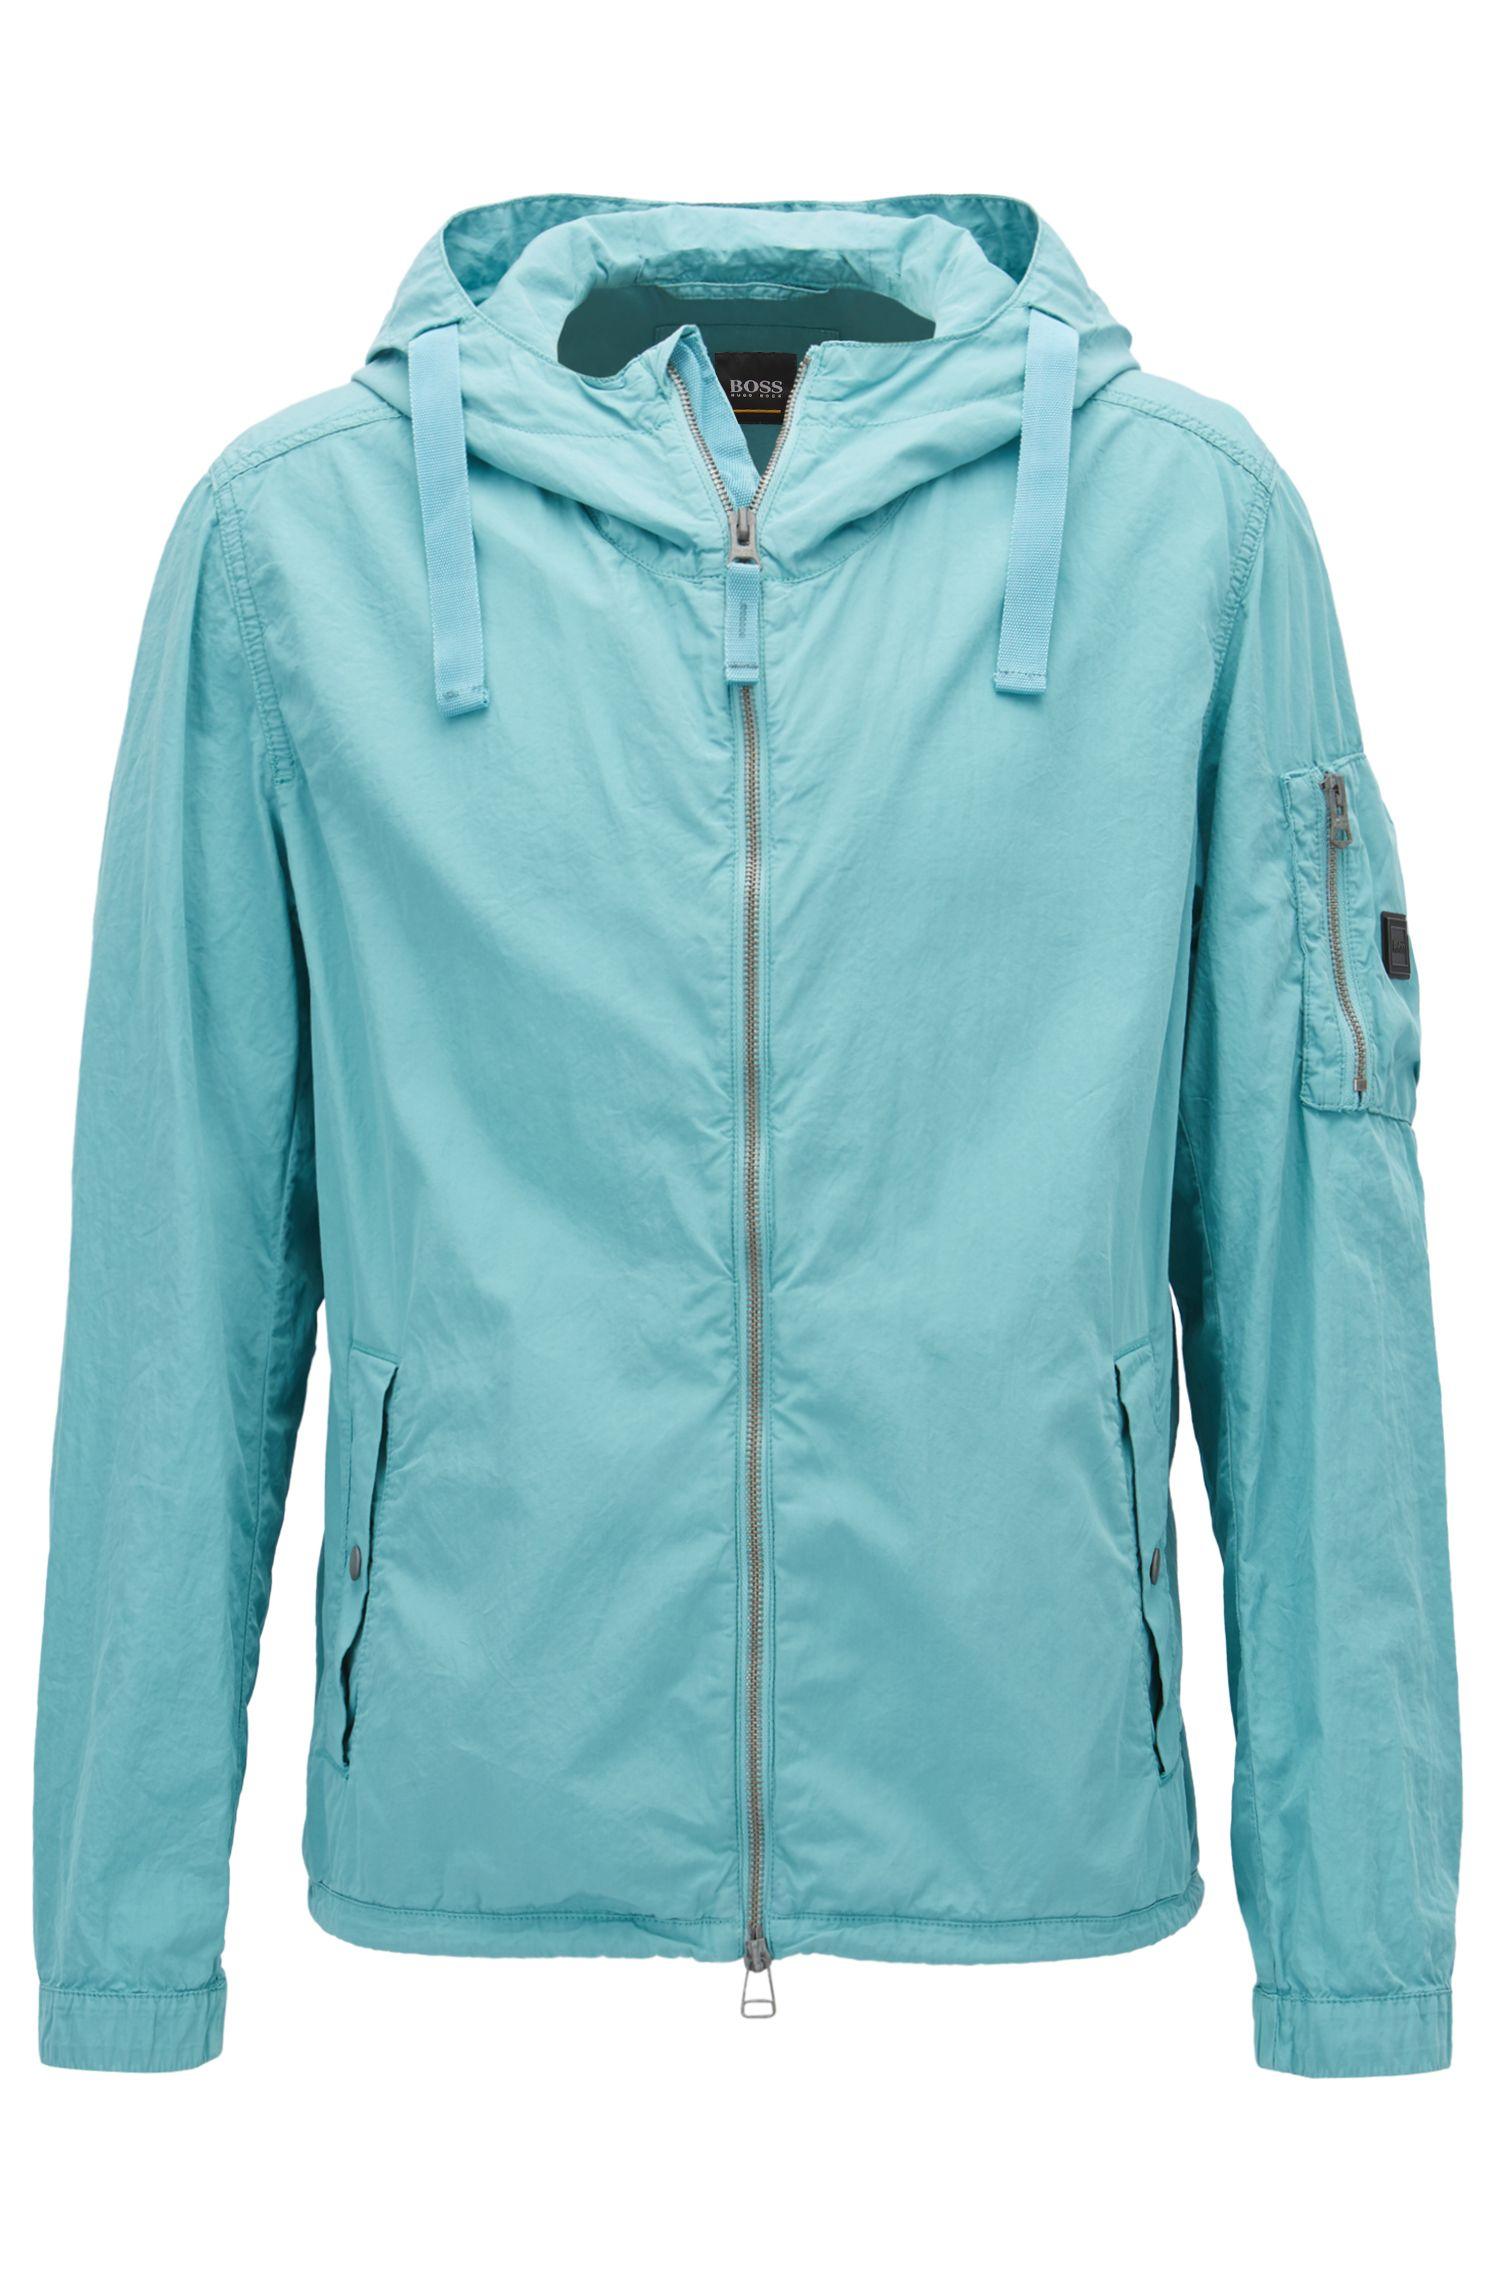 Water-repellent jacket in Italian mercerised cotton